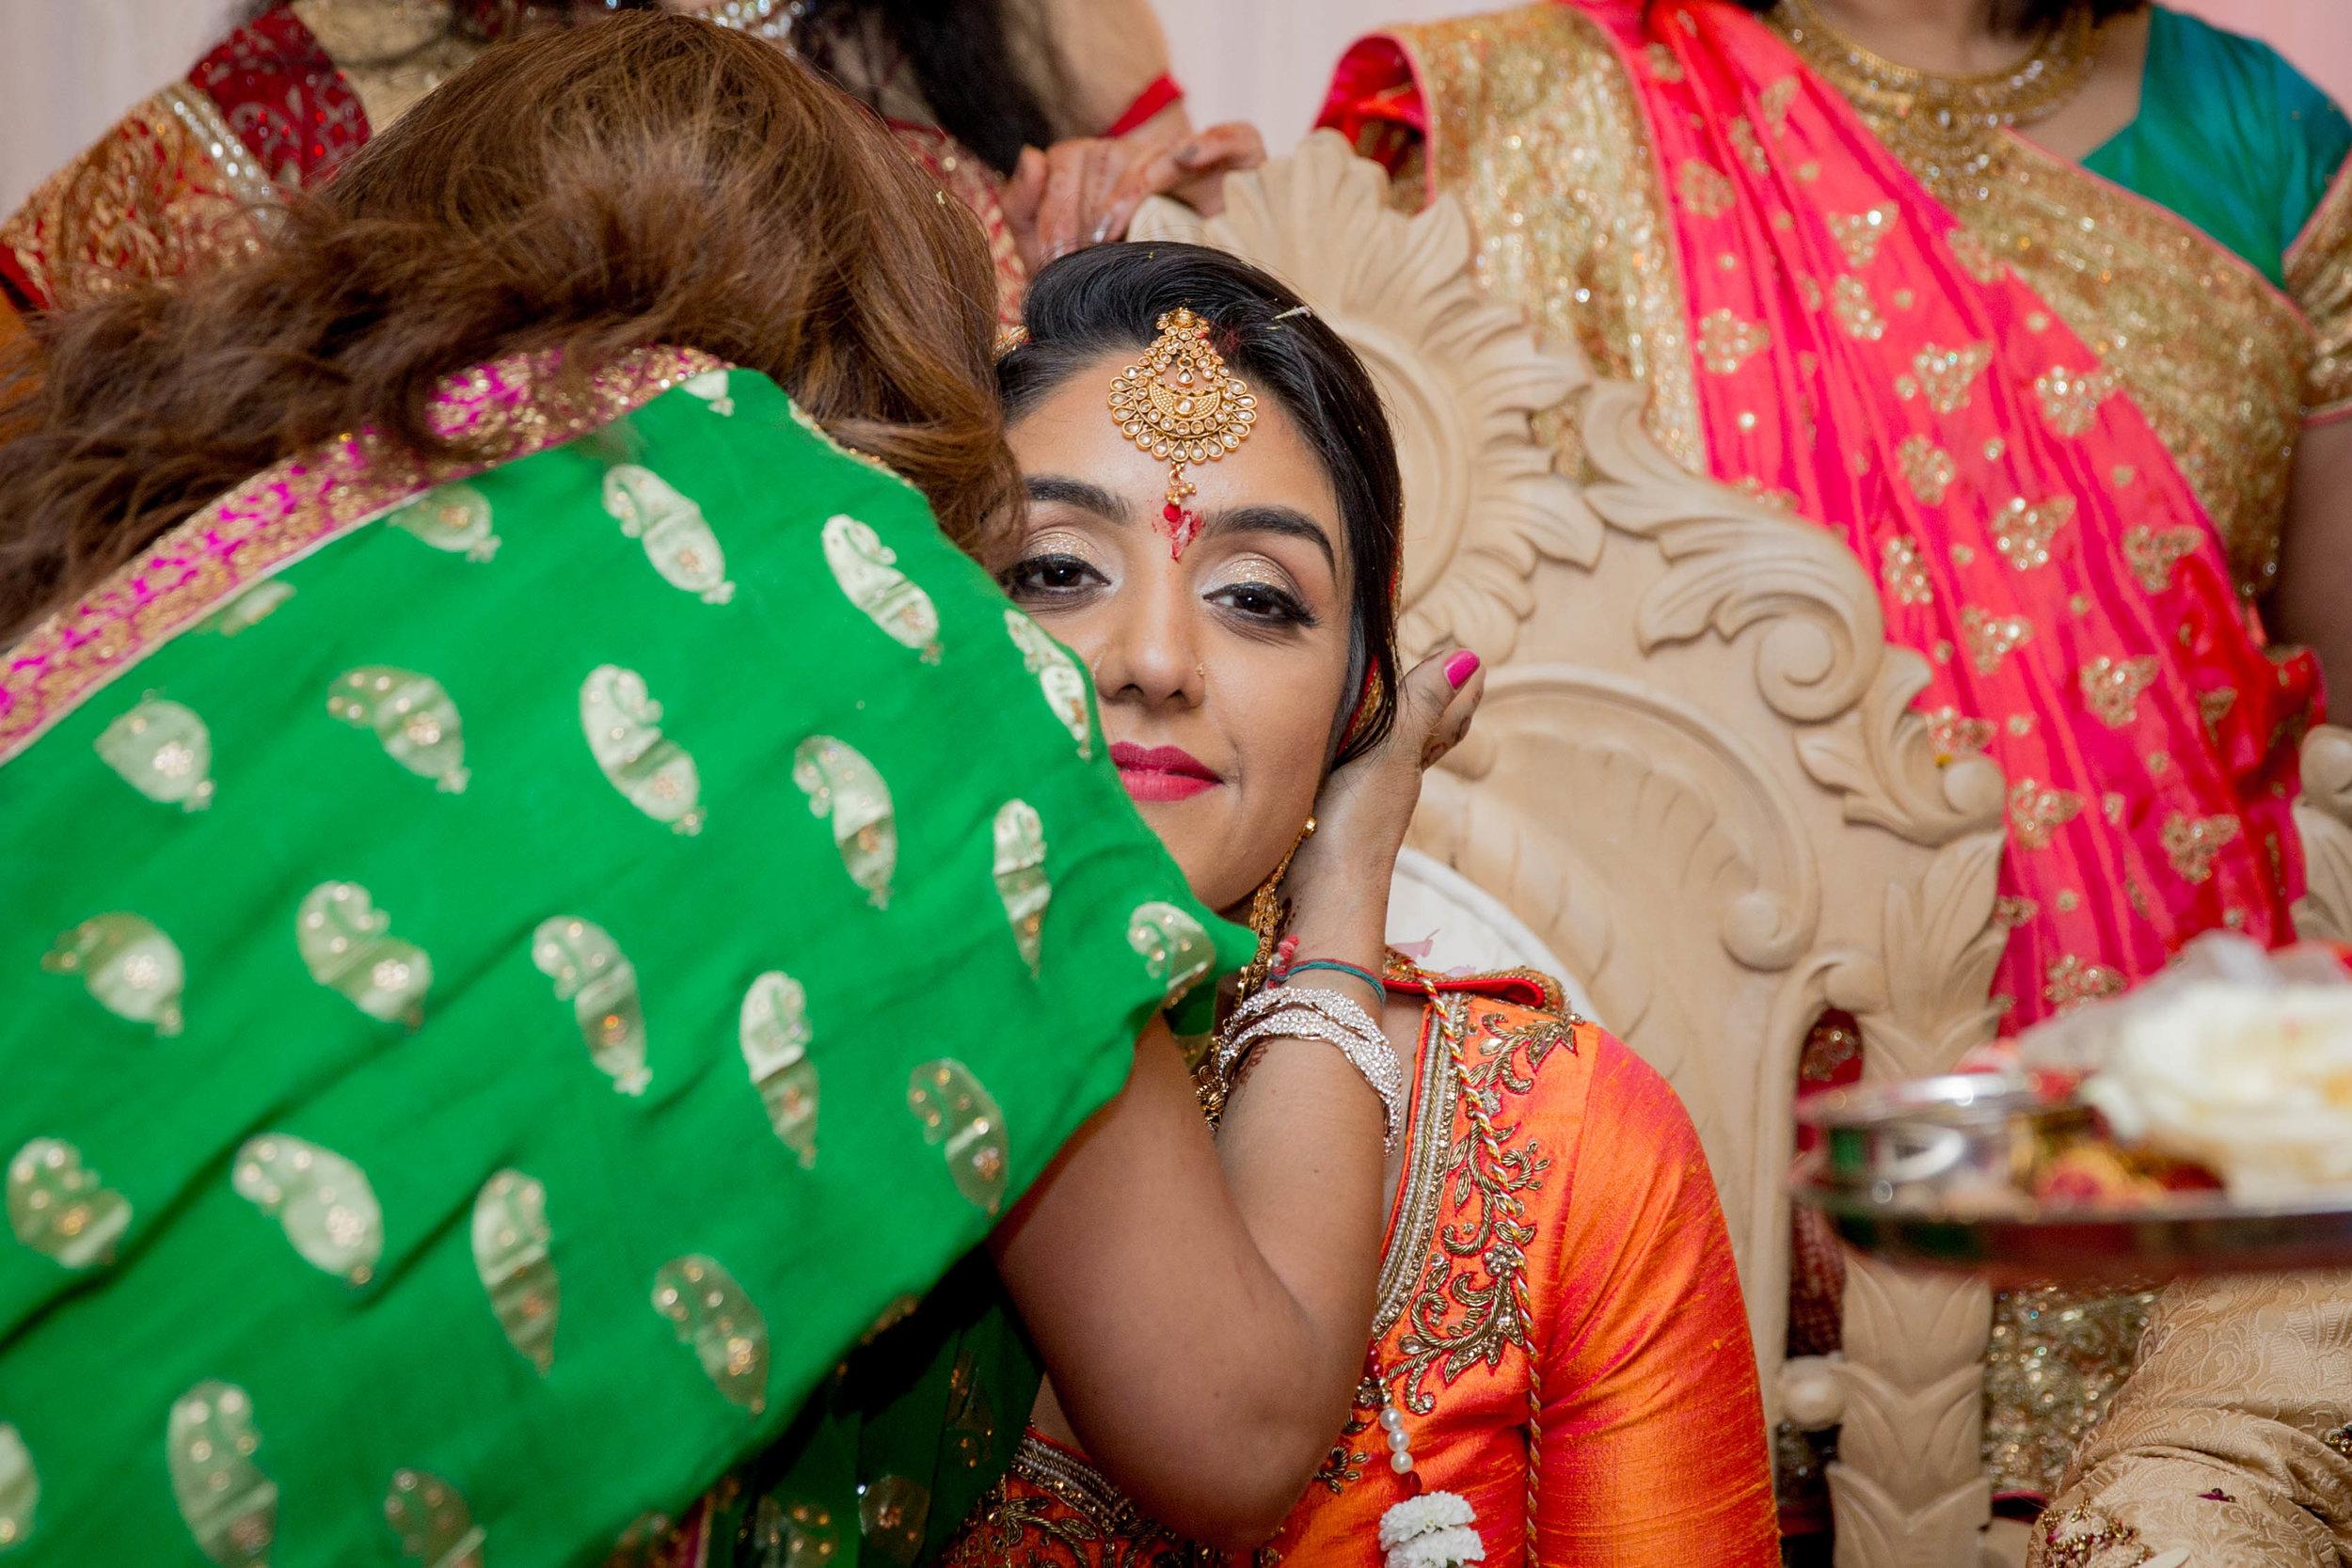 premier-banquetting-london-Hindu-asian-wedding-photographer-natalia-smith-photography-30.jpg